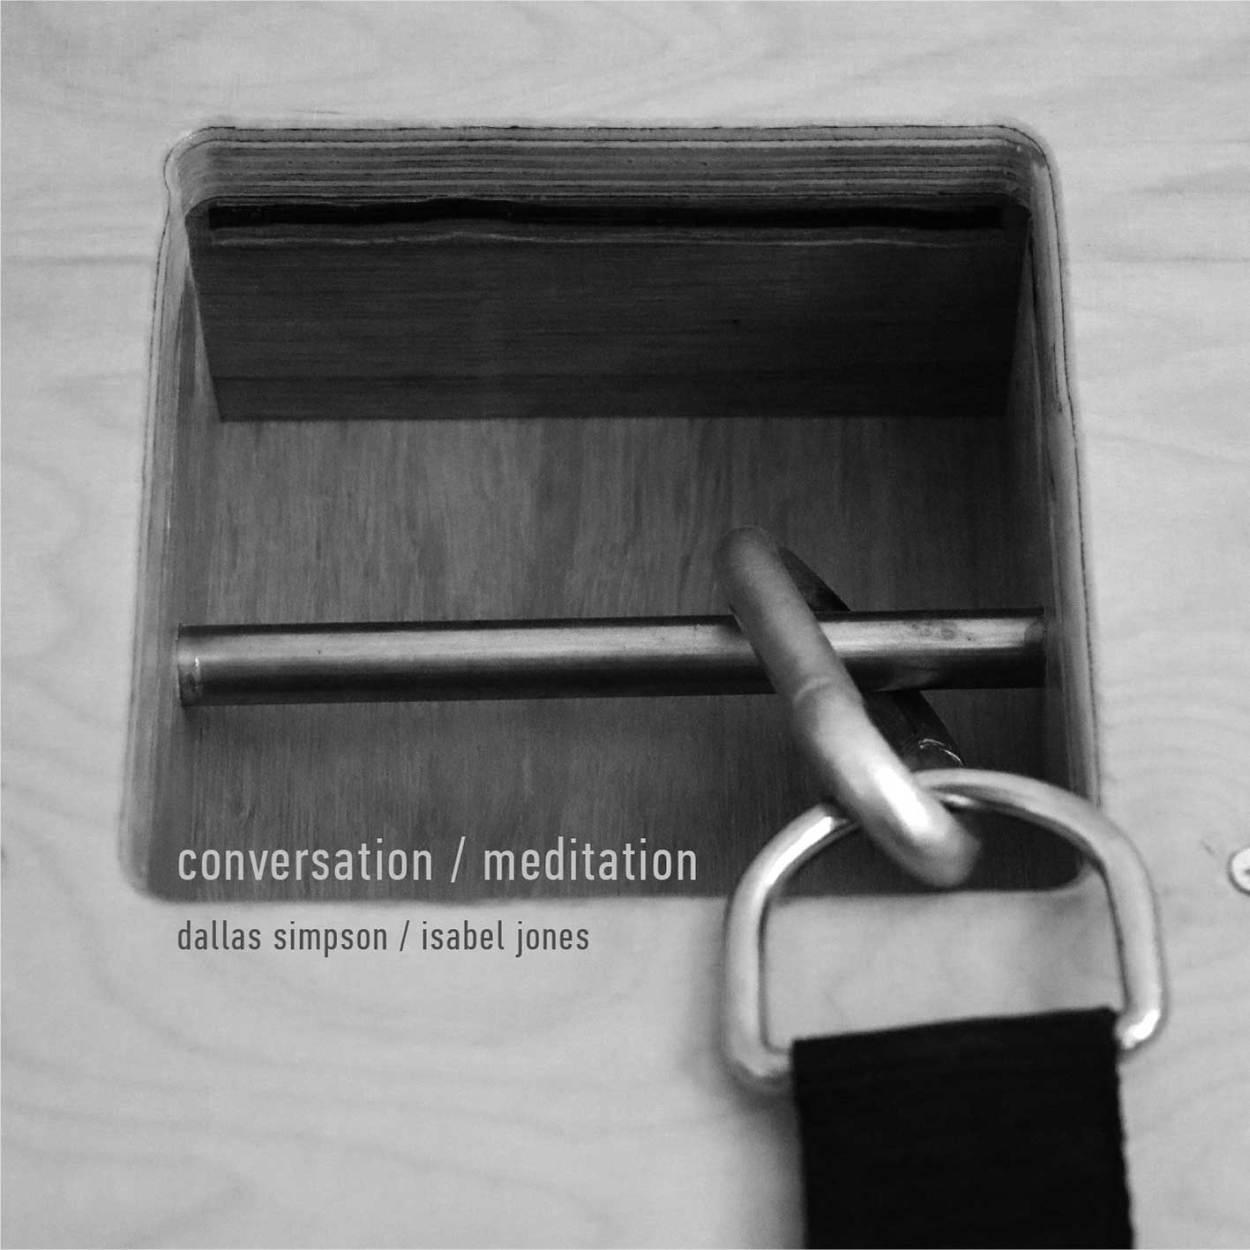 dallas simpson / isabel jones – conversation / meditation